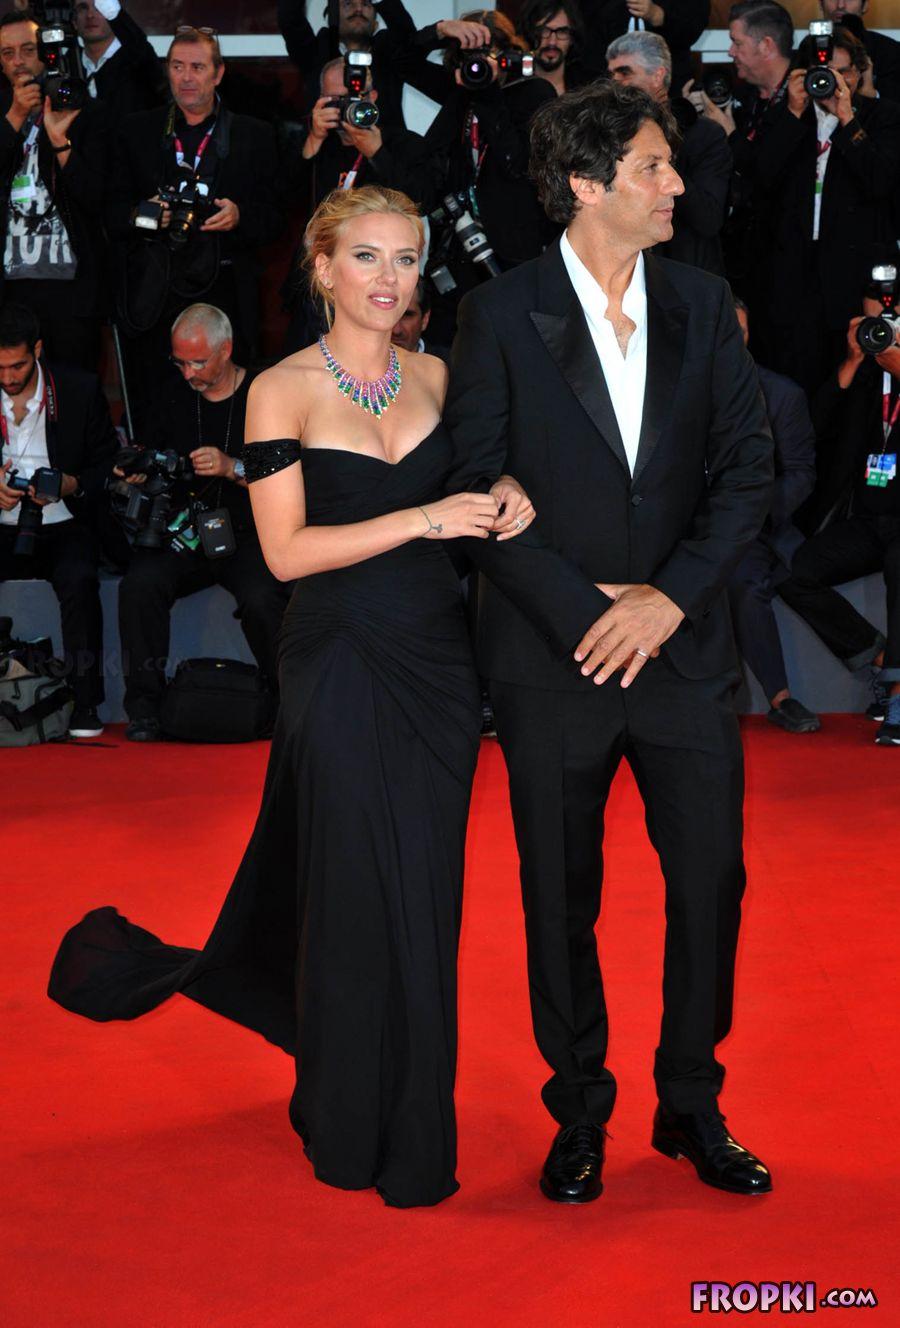 Scarlett Johansson Fropki 35